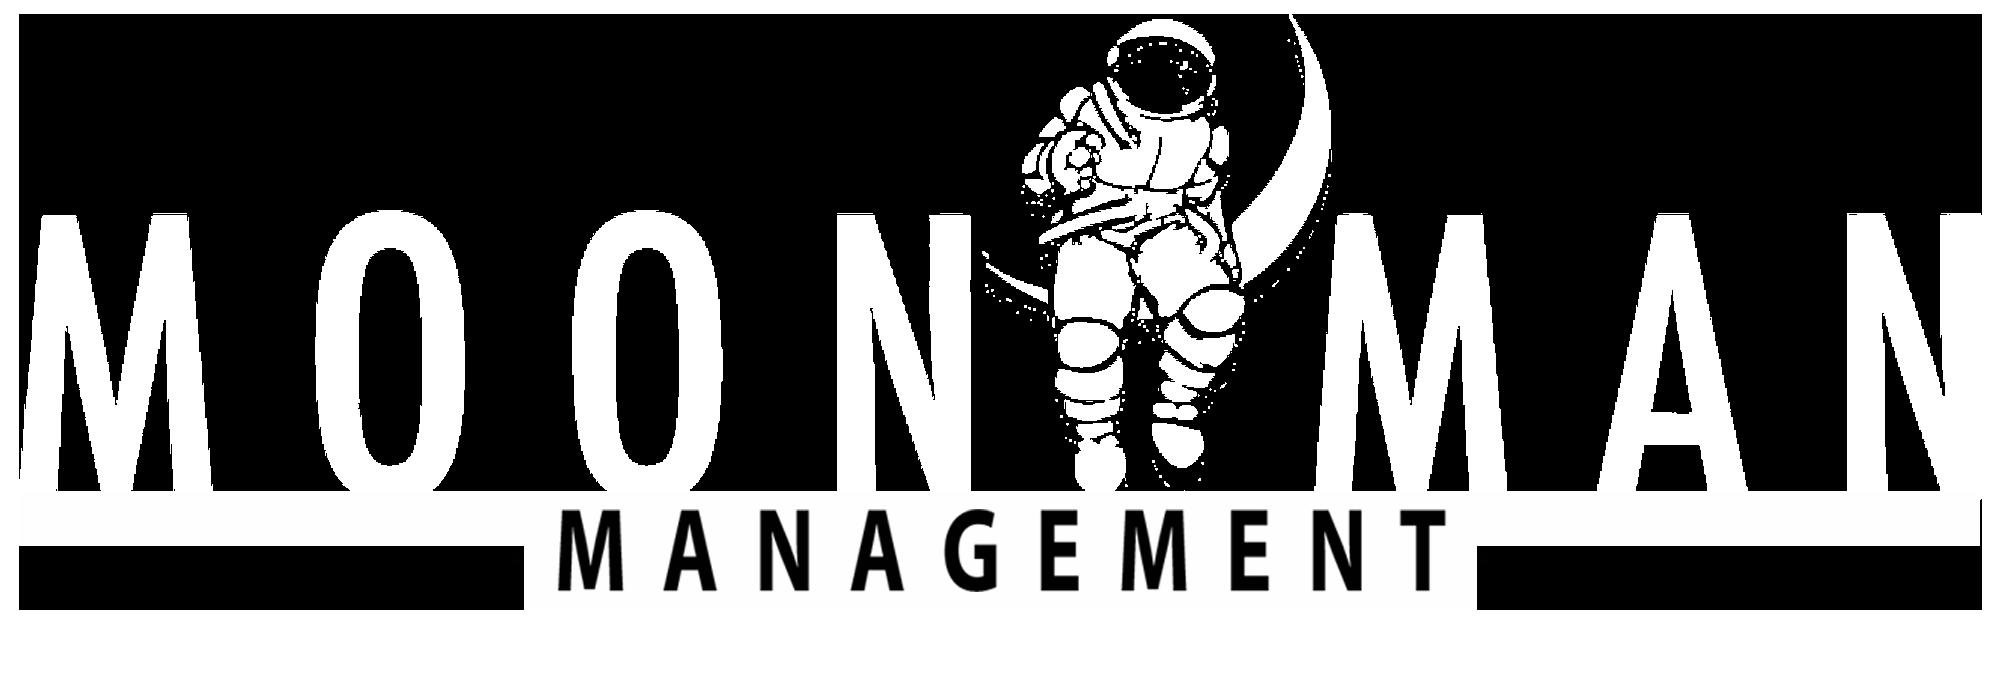 Moonman Management logo